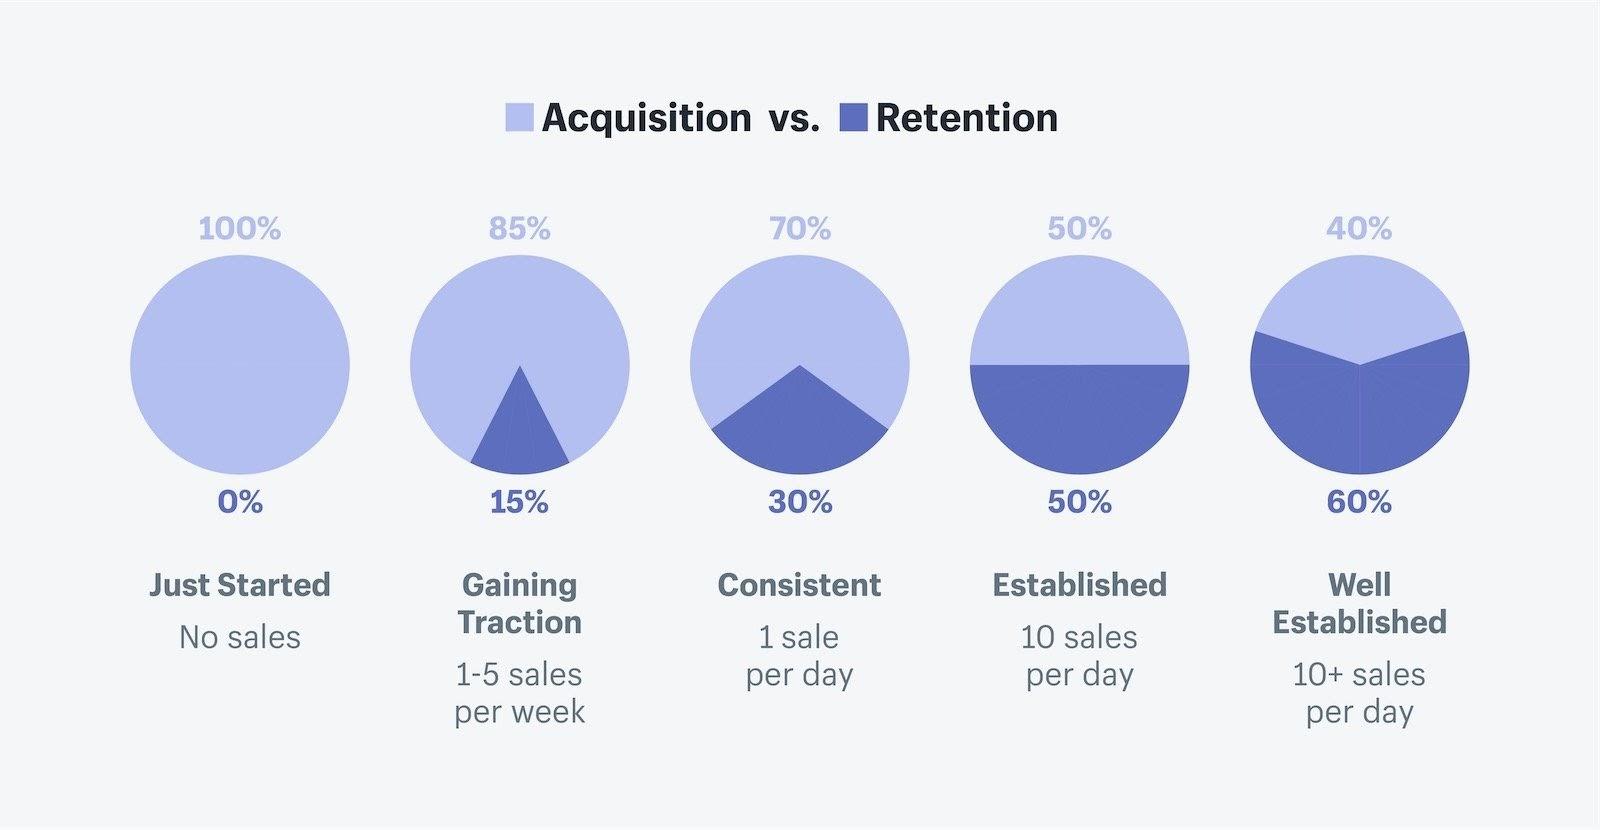 Customer retention vs customer acquisition